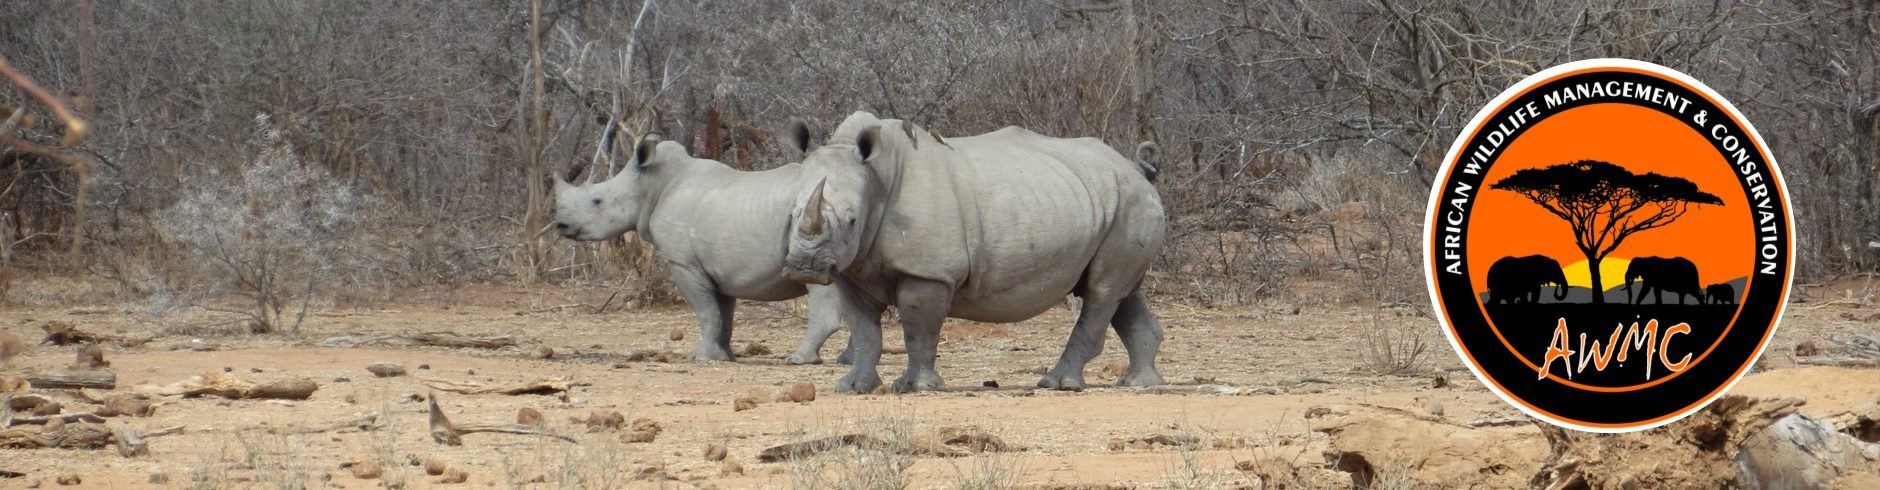 African Wildlife Management & Conservation